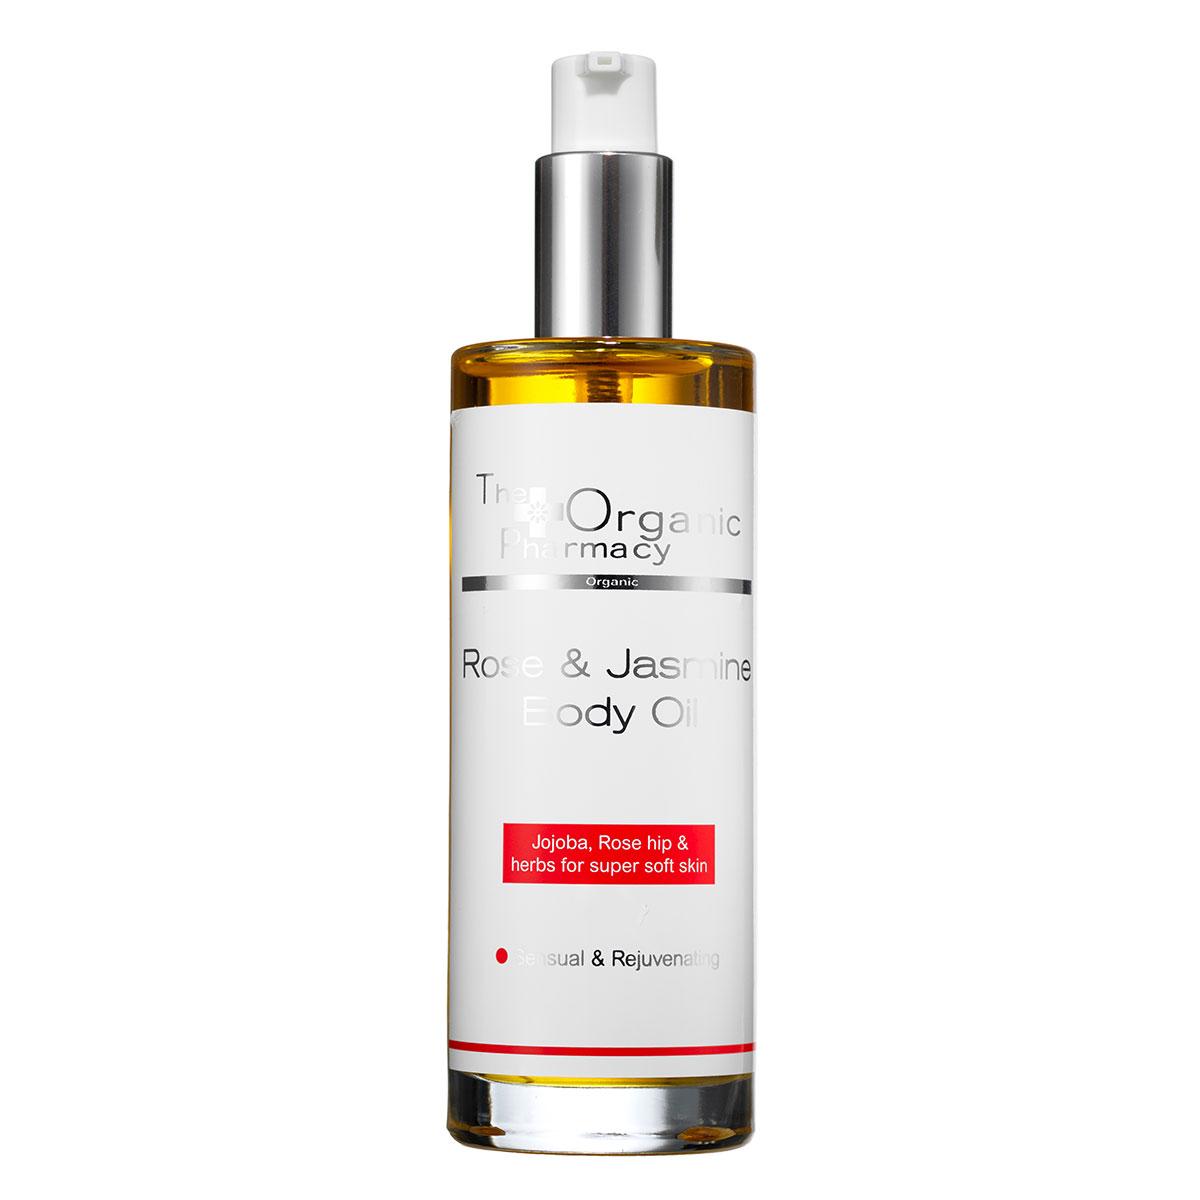 Billede af The Organic Pharmacy Rose & Jasmine Body Oil - 100 ml